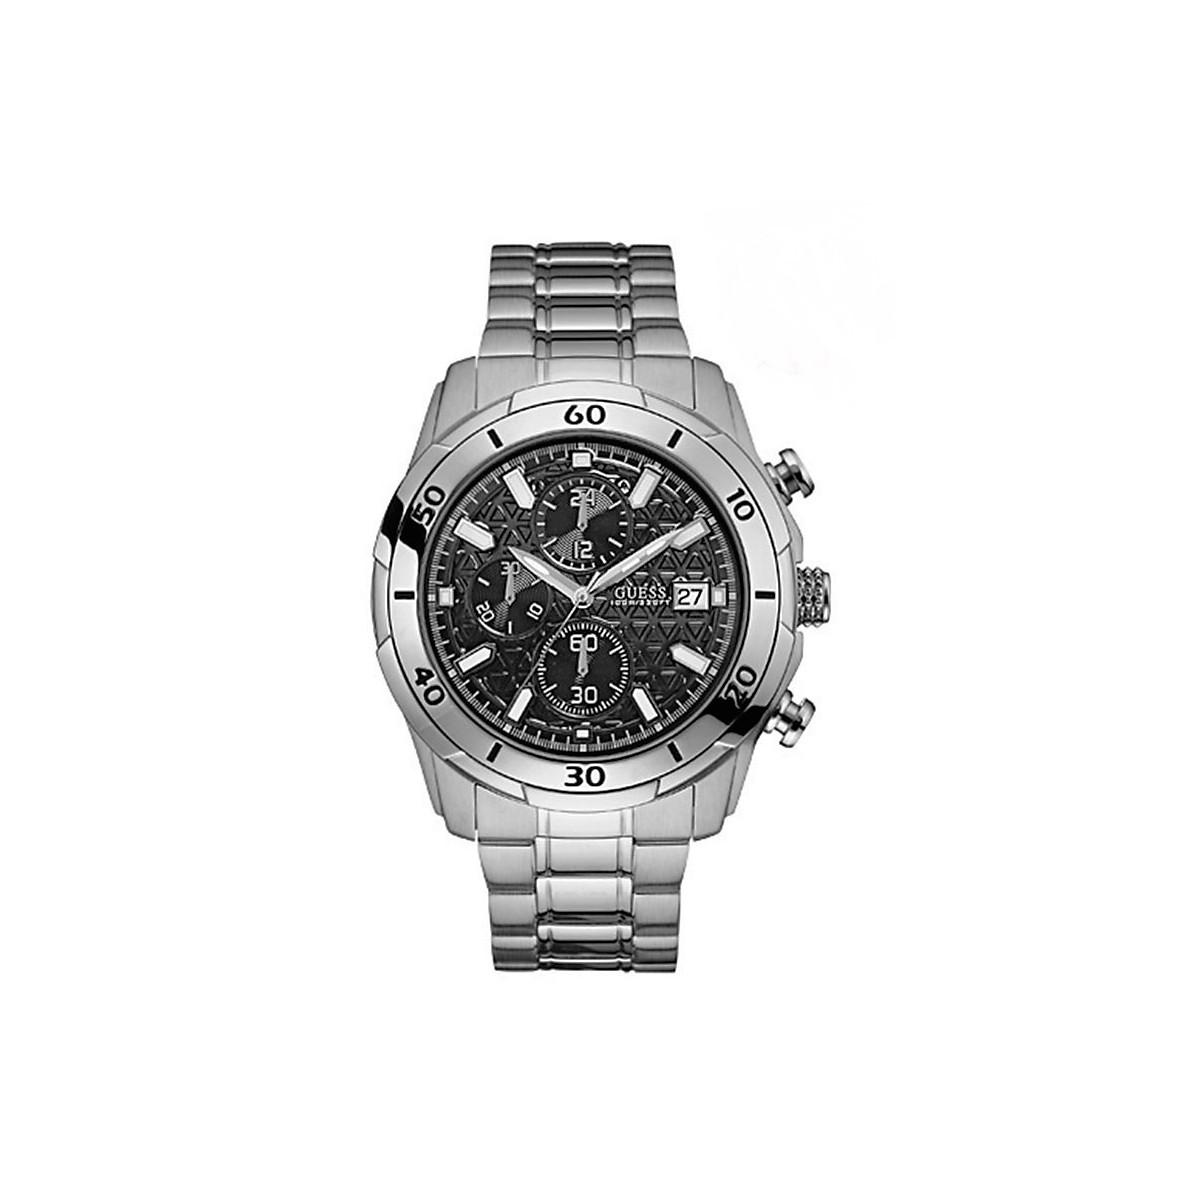 https://www.gaberjoyeria.com/3057-thickbox_default/reloj-guess-w0746g2.jpg